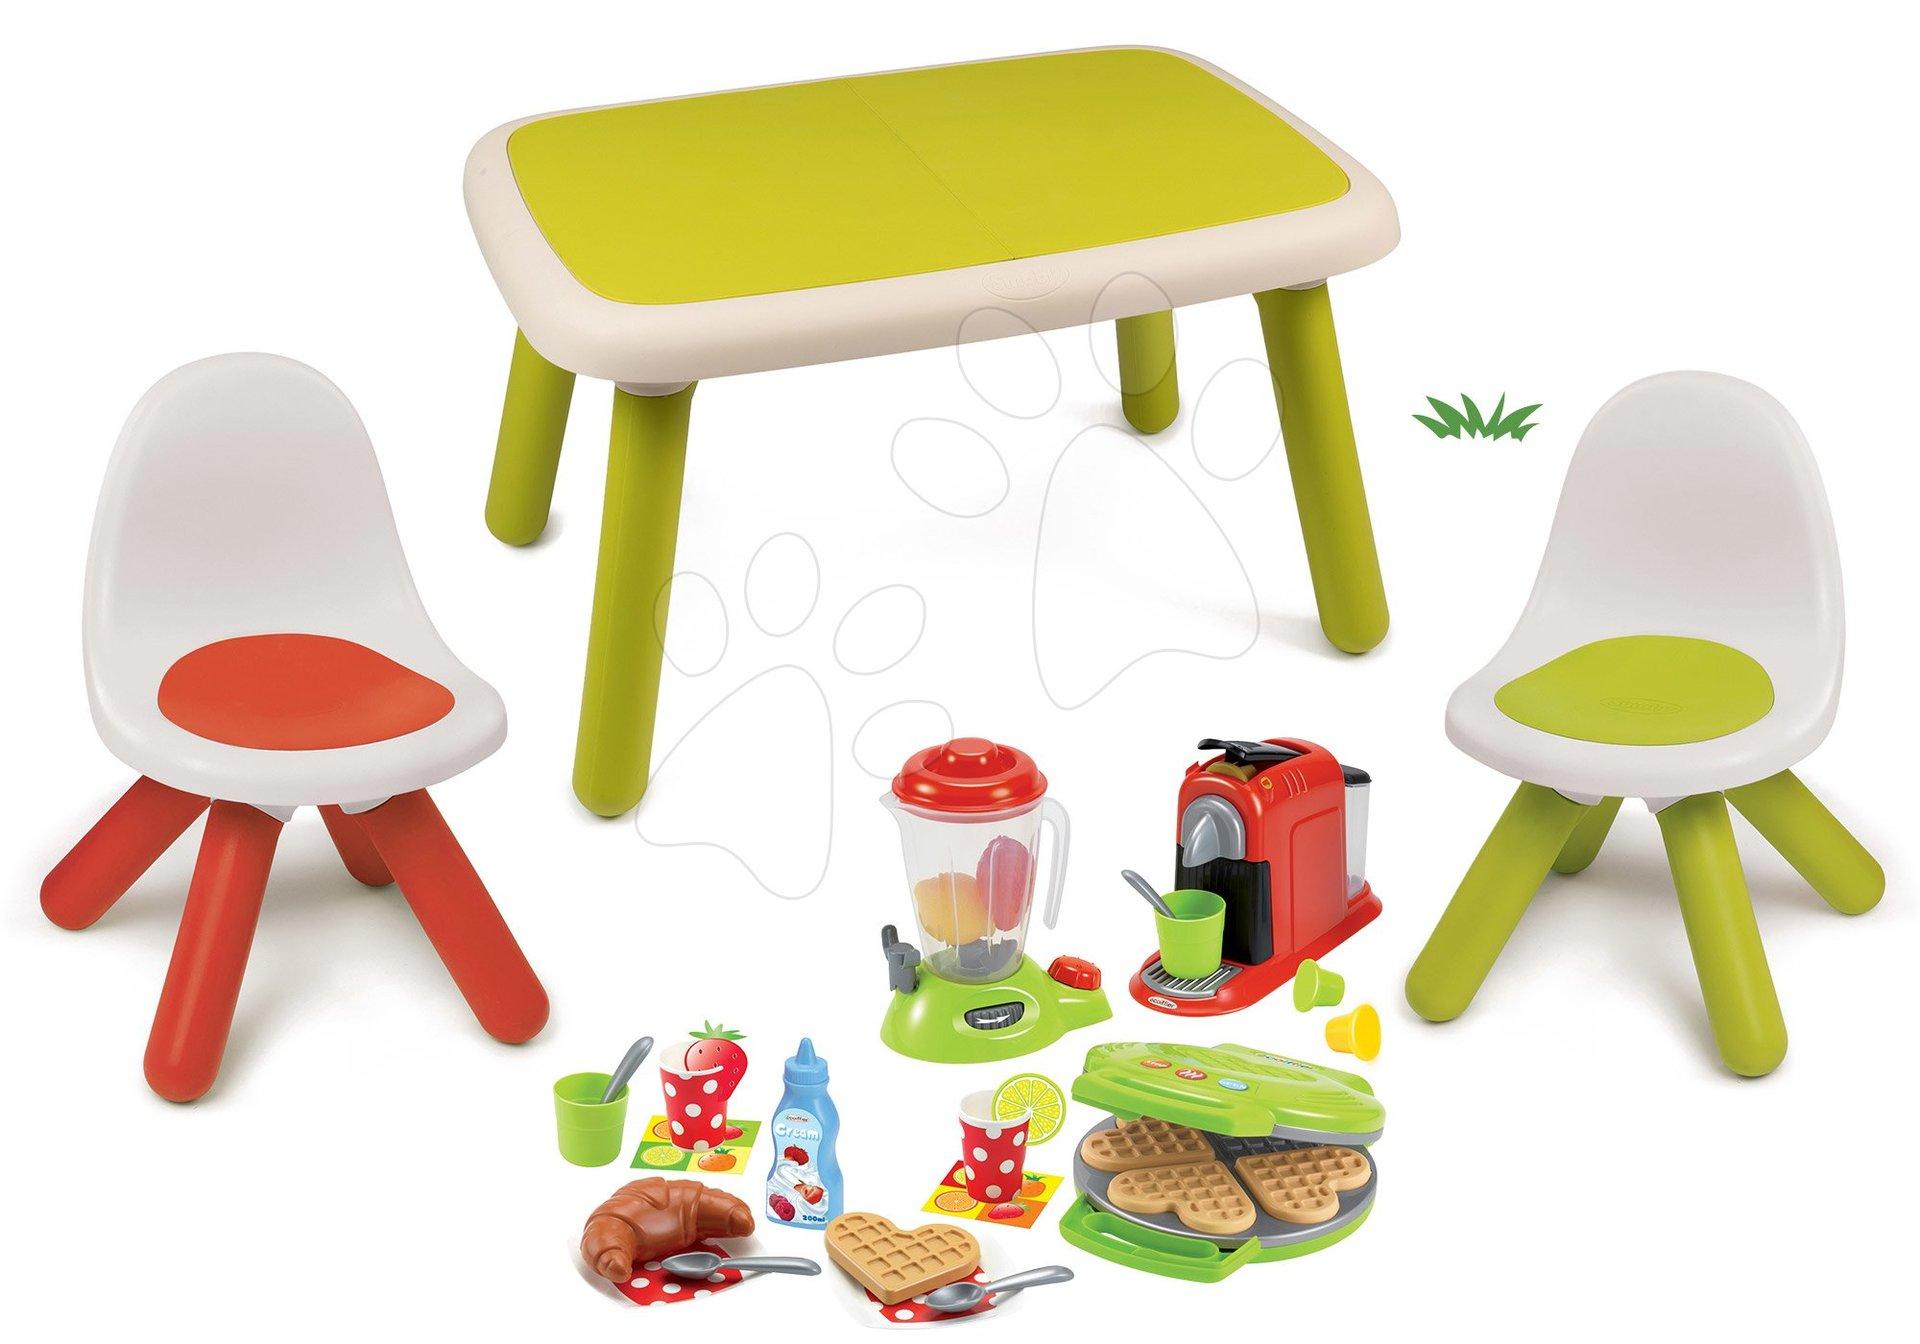 Set stôl pre deti KidTable zelený Smoby s dvoma stoličkami s UV filtrom a vaflovač s kávovarom a mixérom